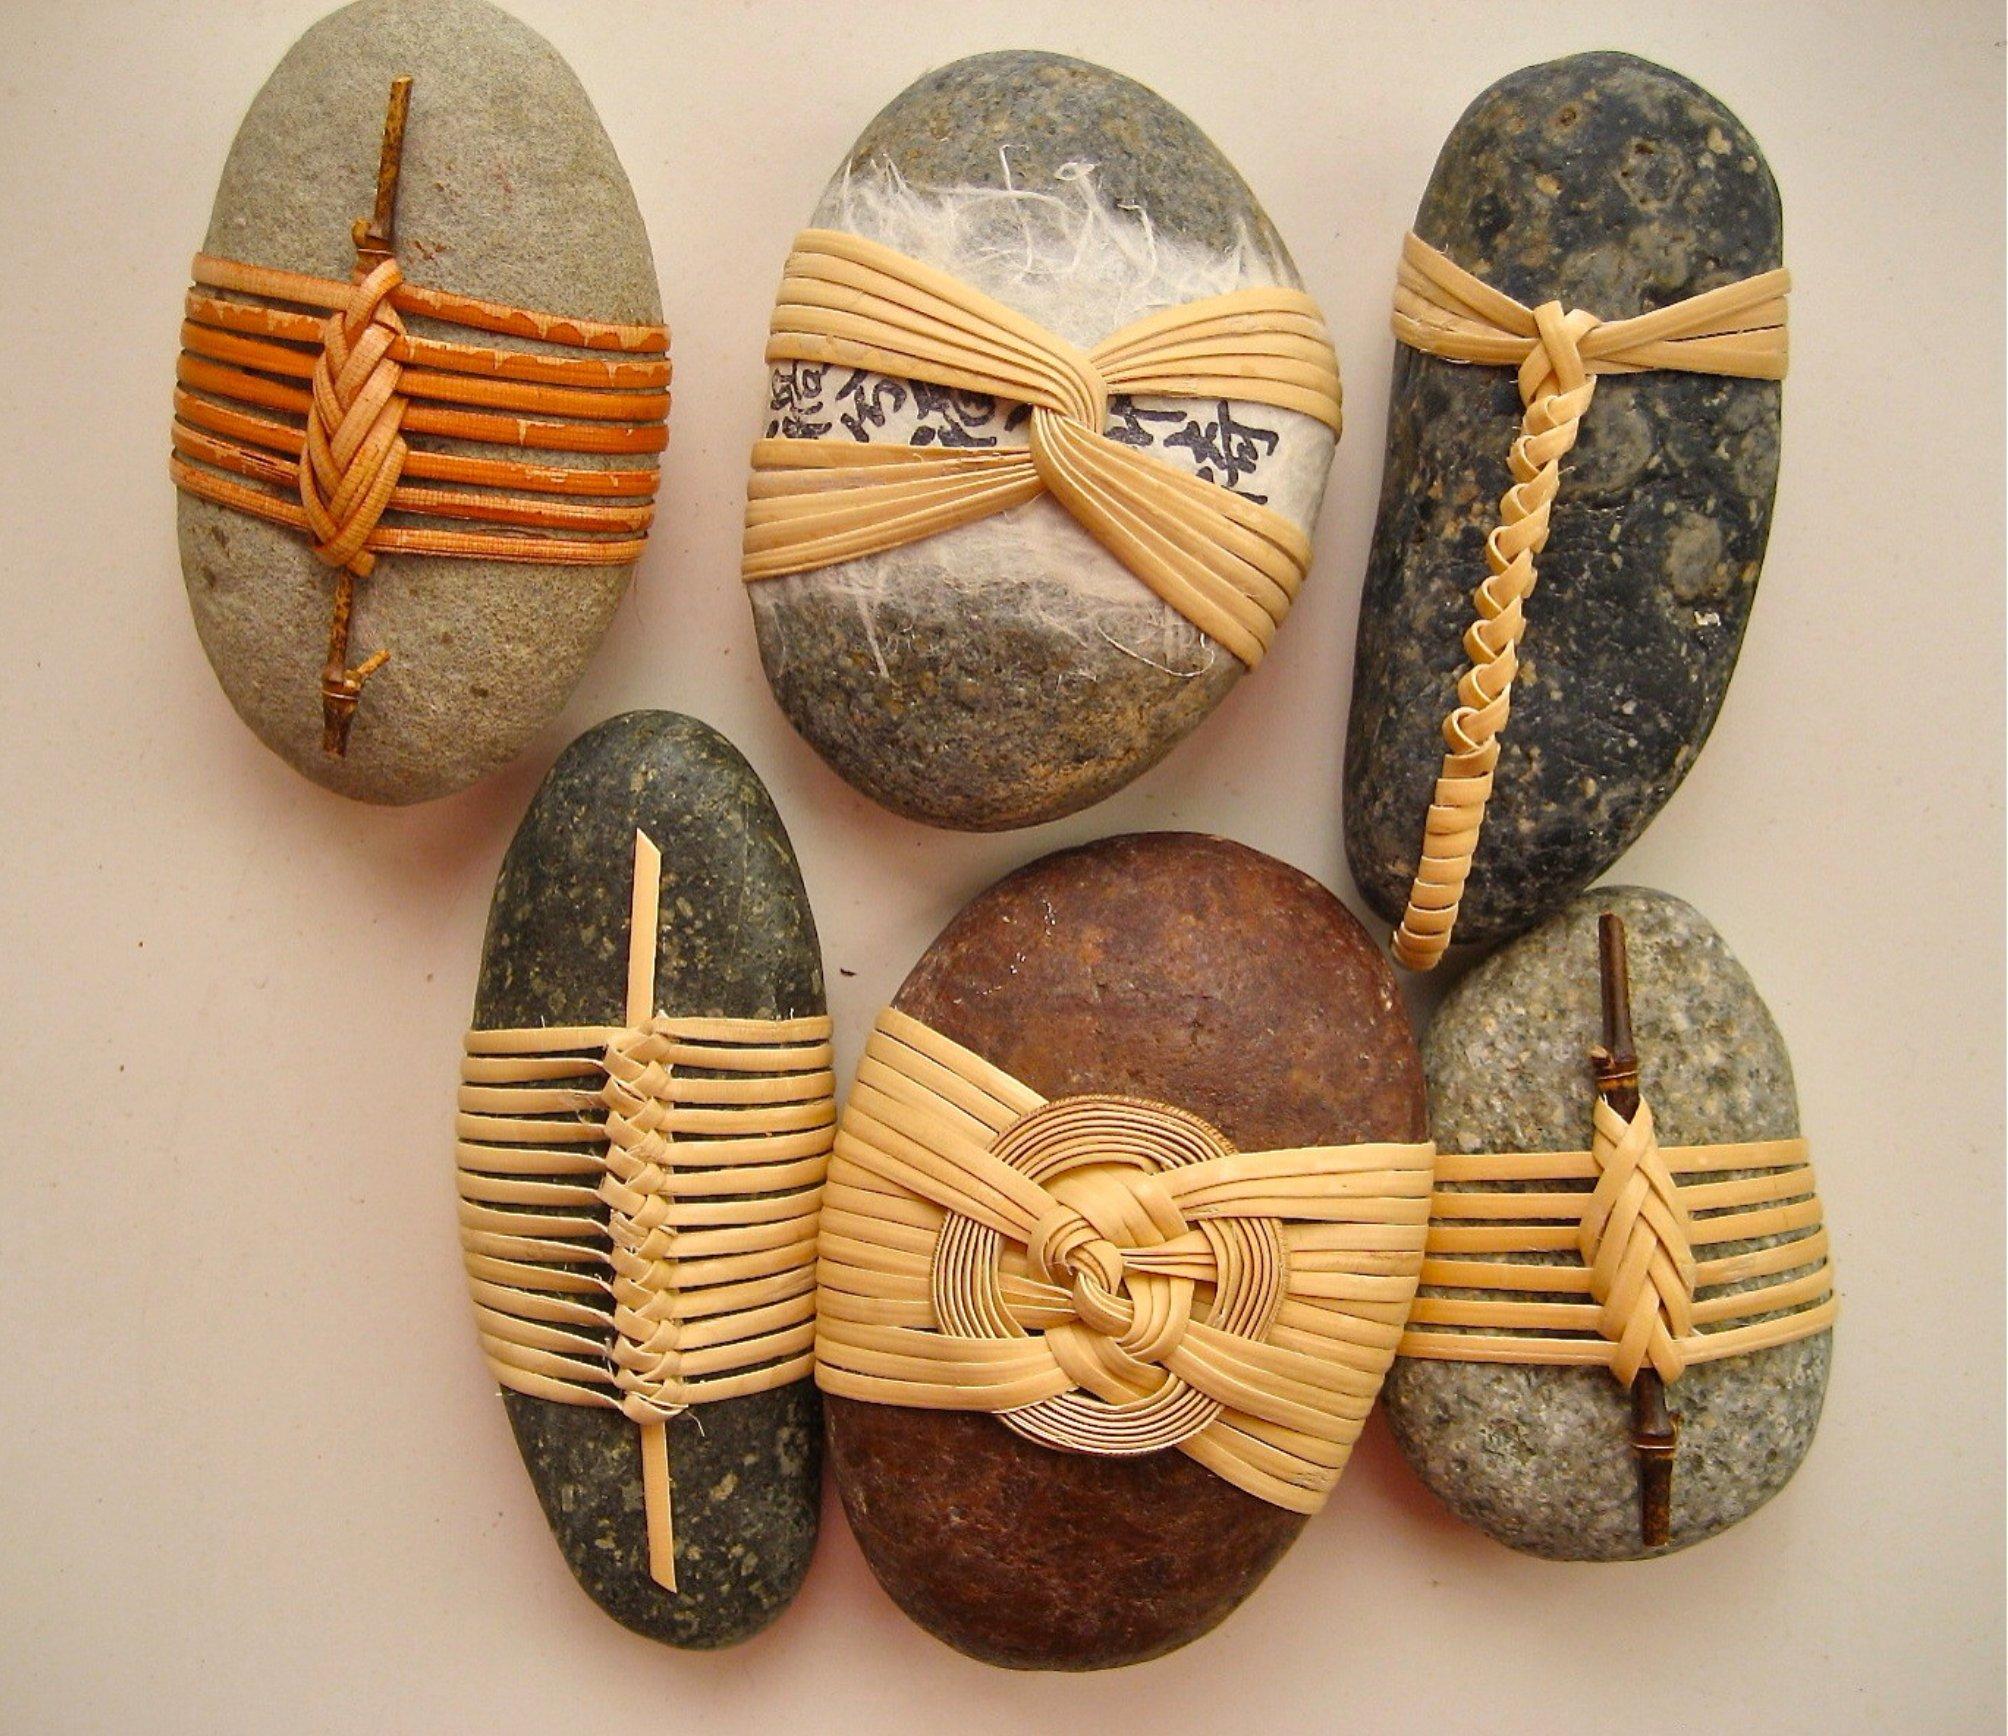 Shibari rocks